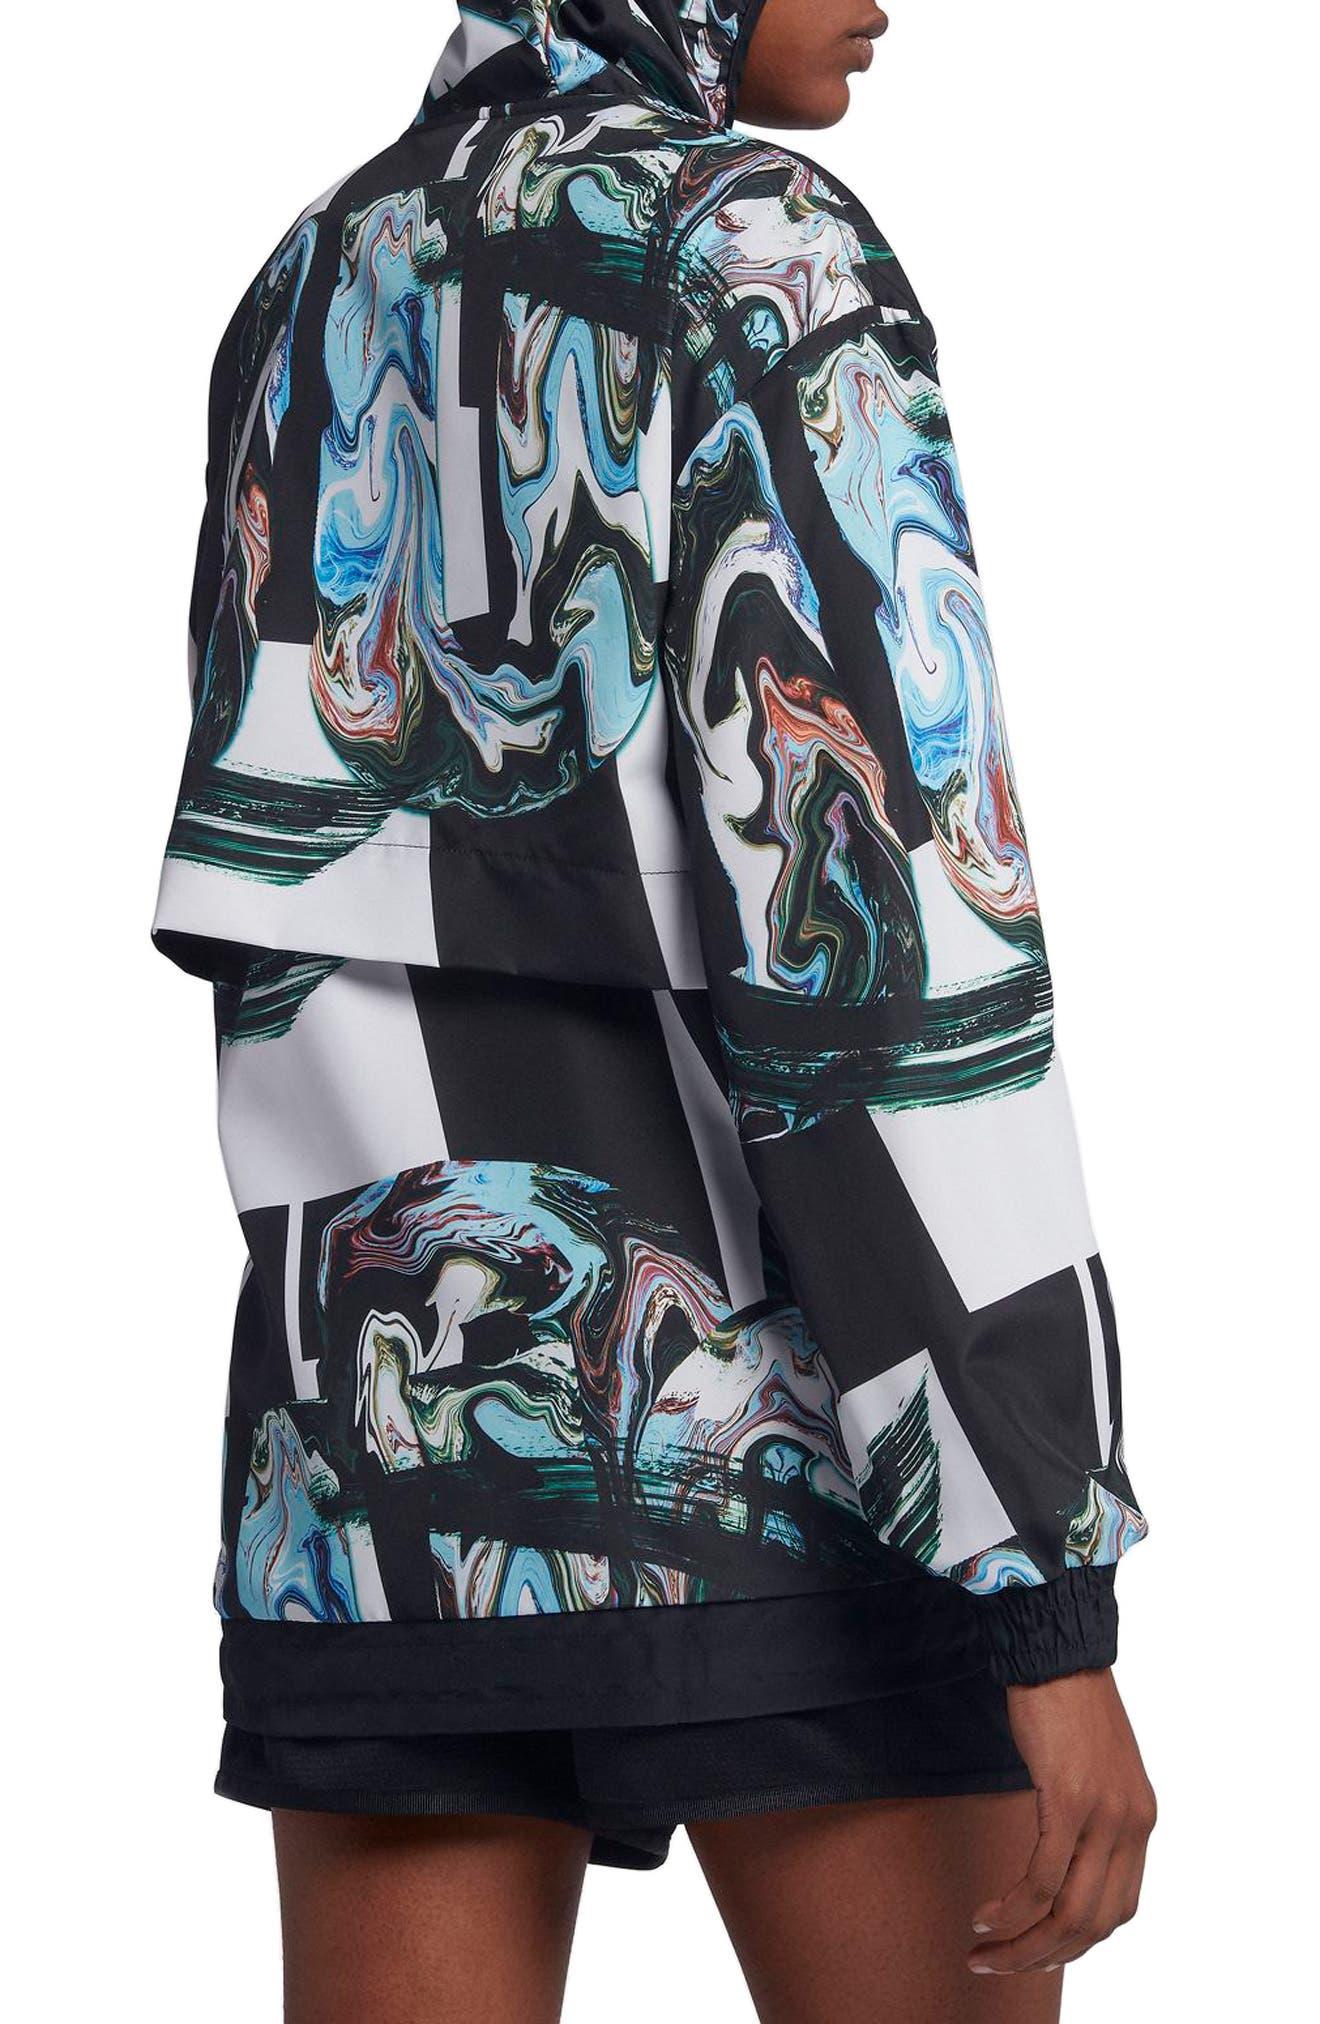 Sportswear Women's Marble Print Hooded Jacket,                             Alternate thumbnail 4, color,